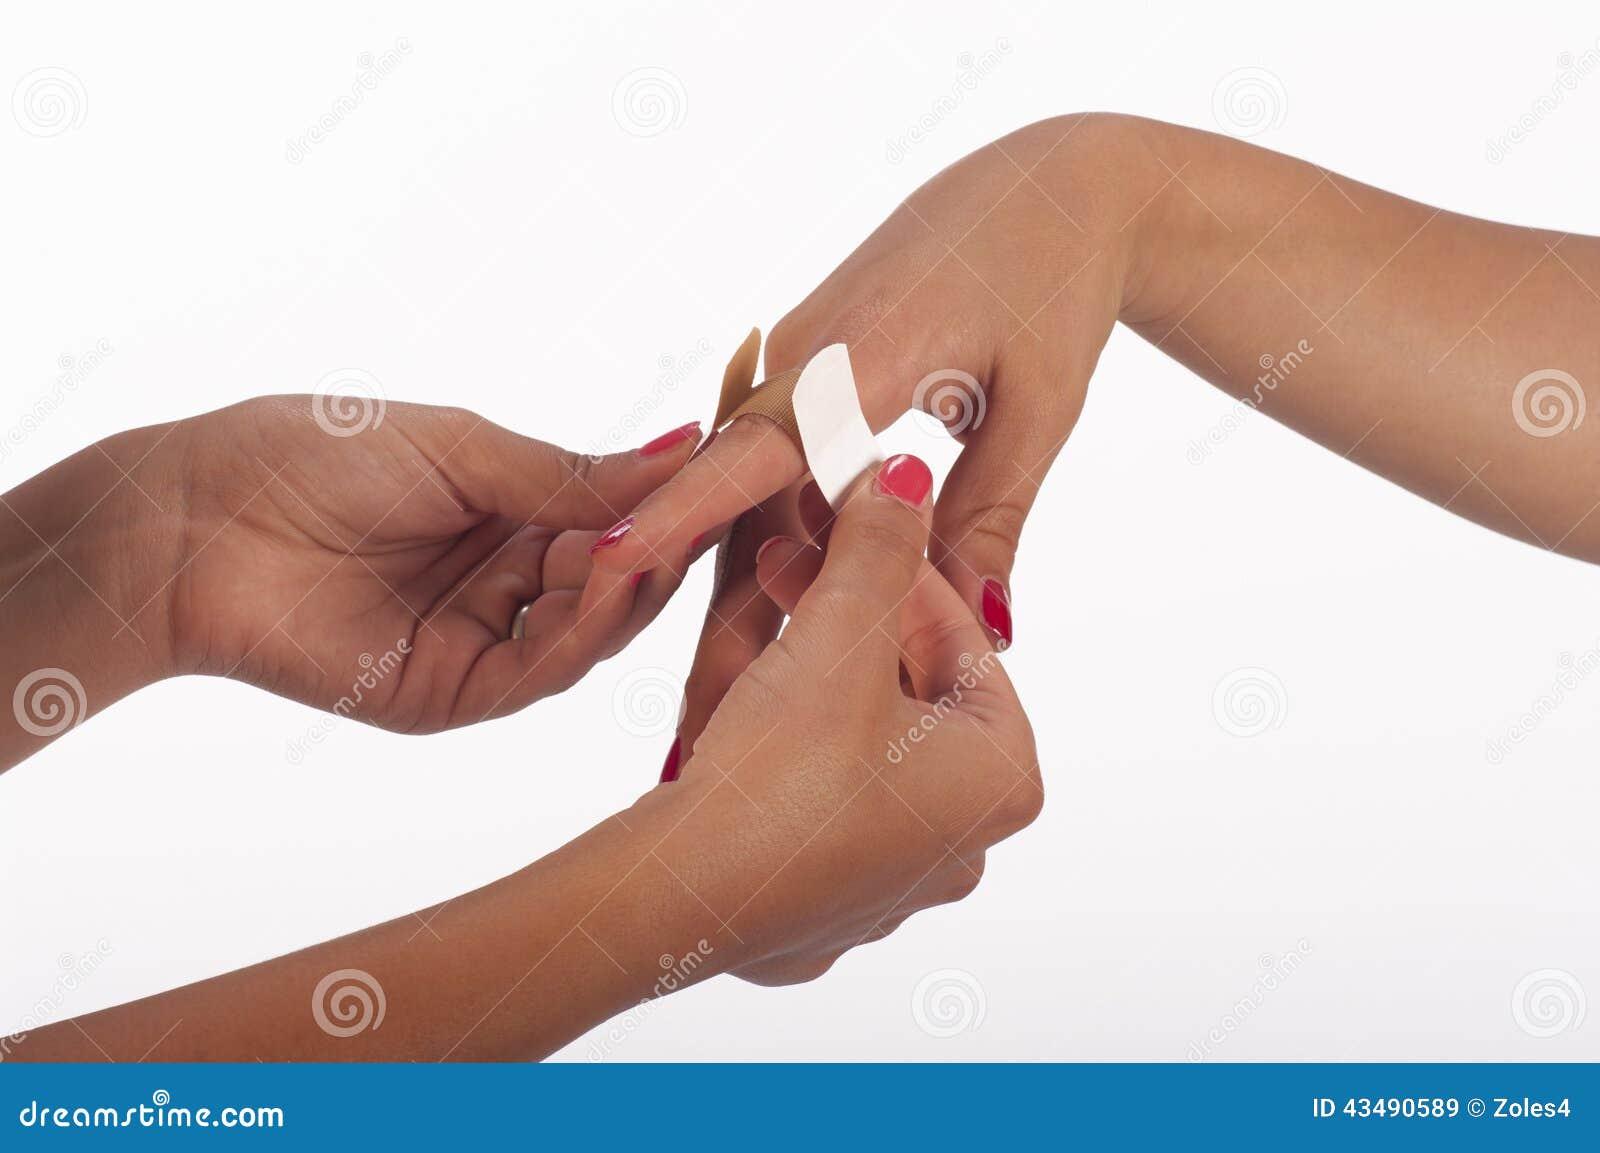 die fremde hand frau squirtet